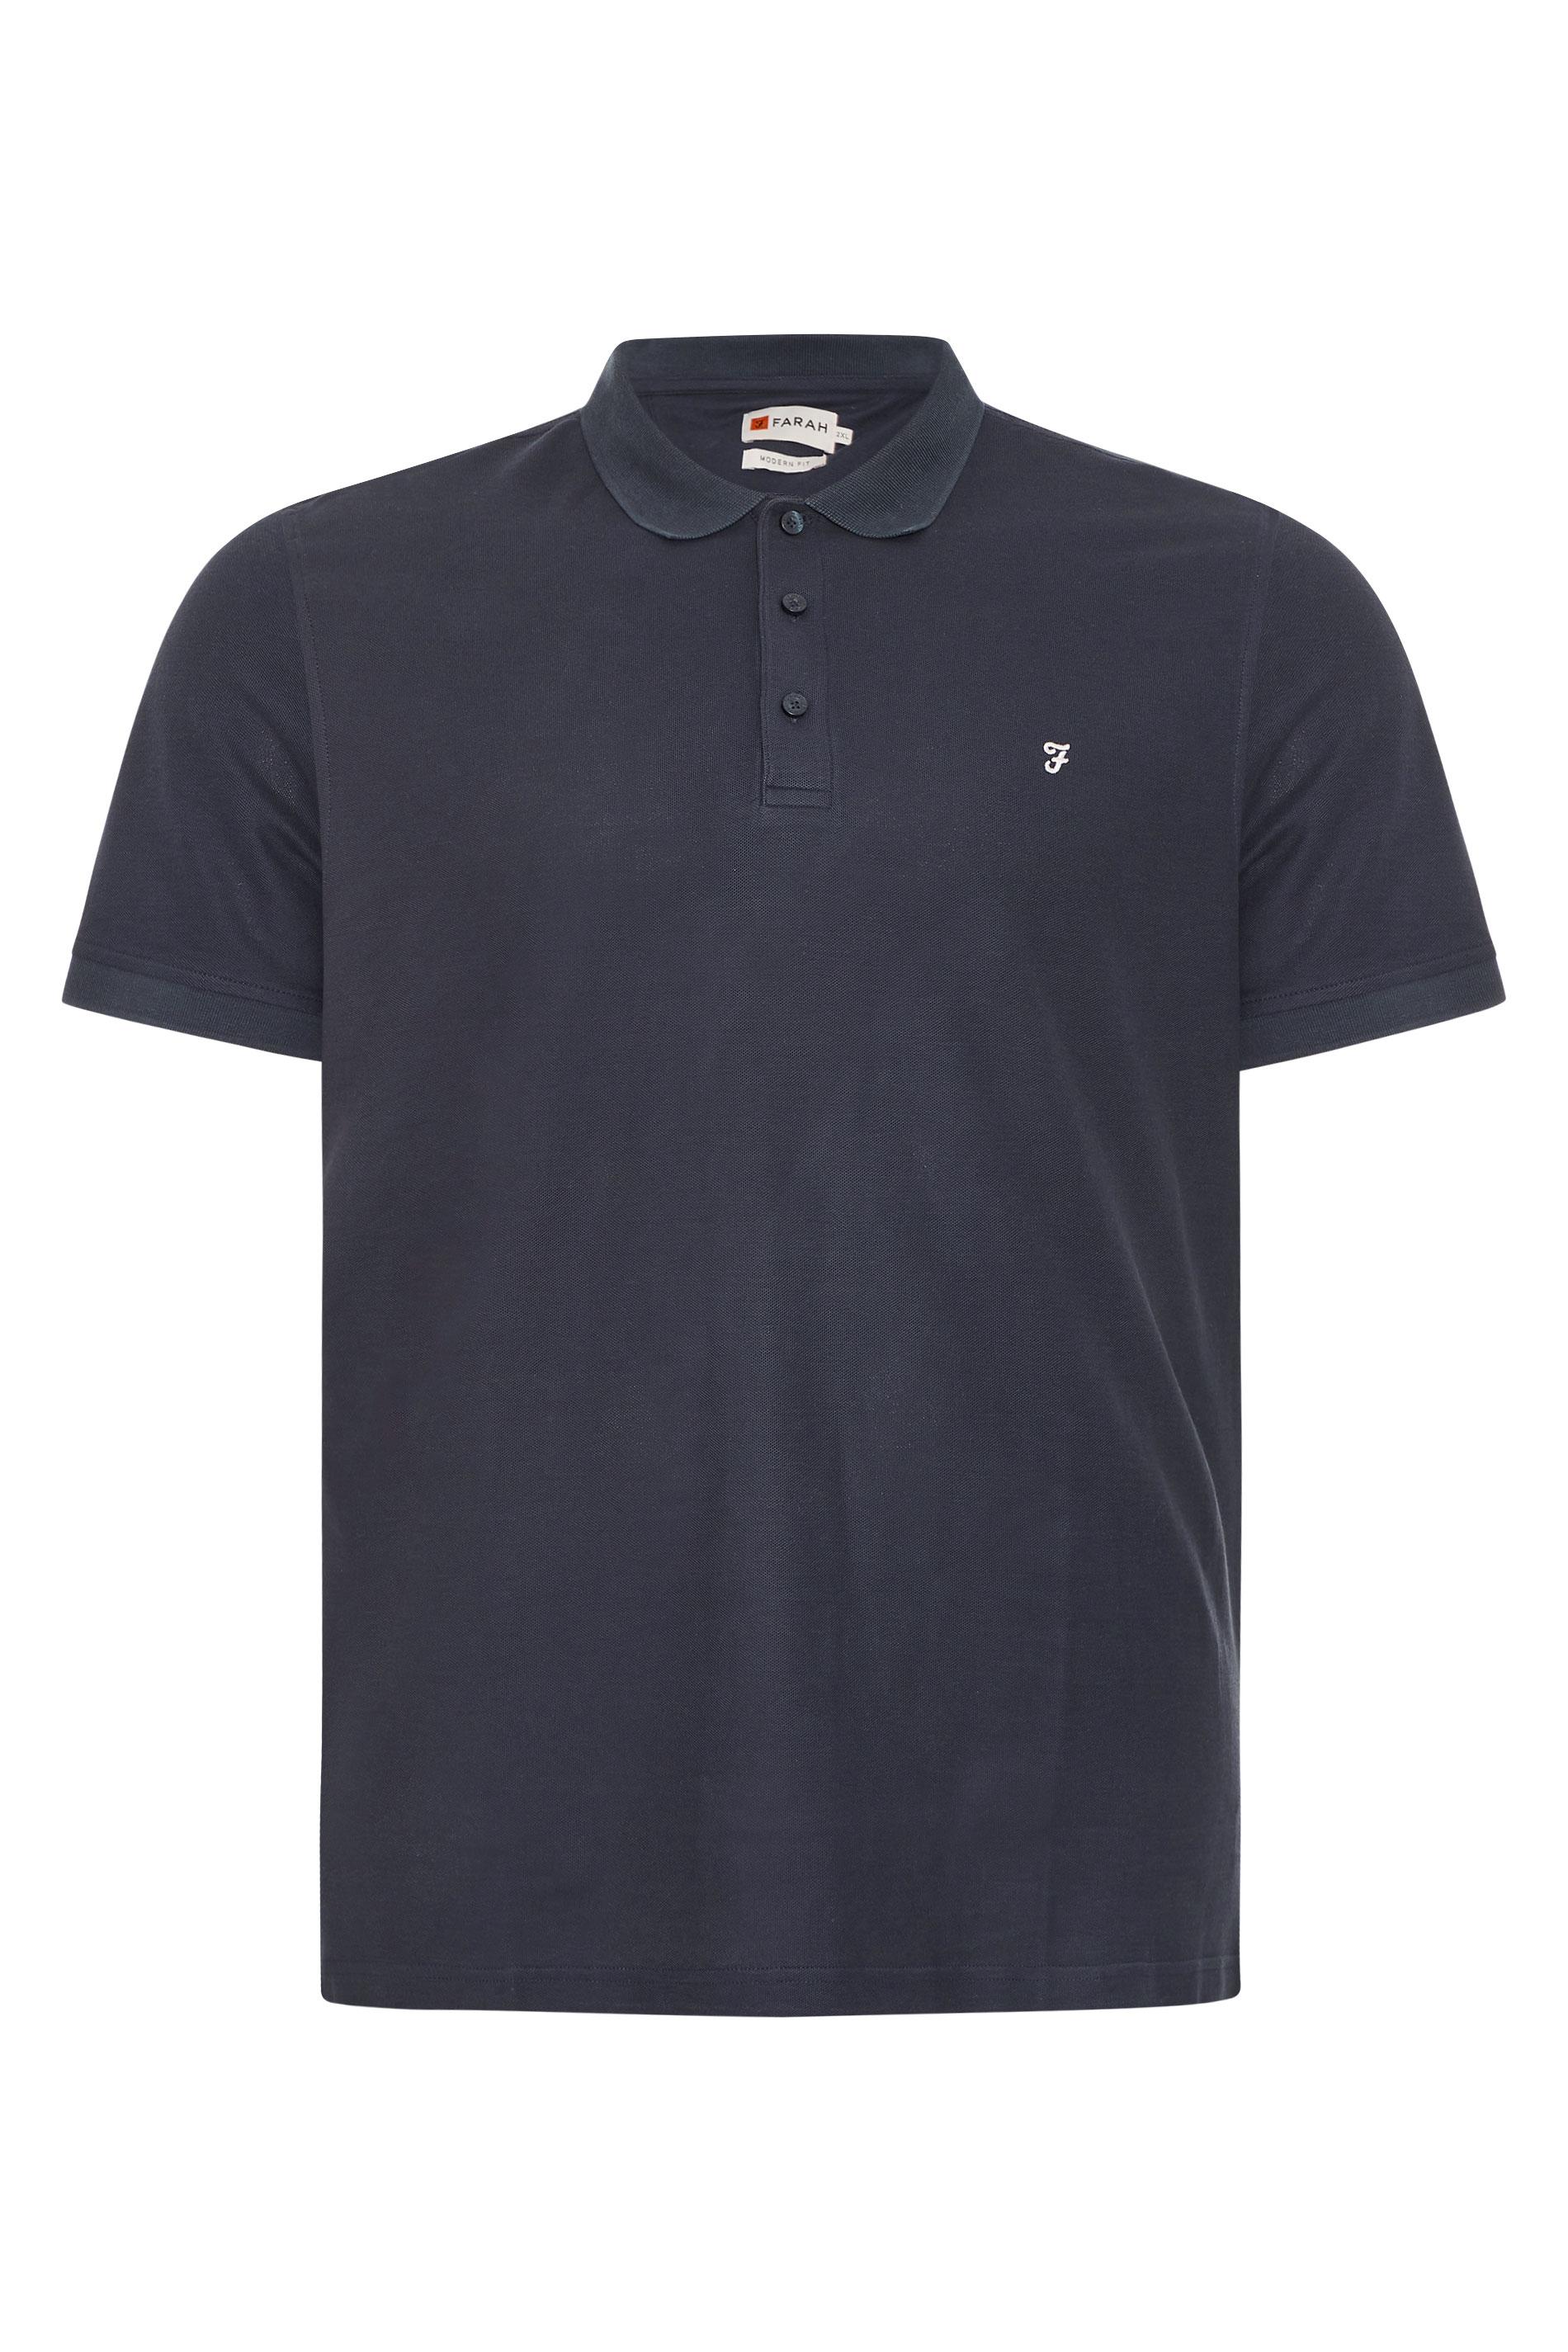 FARAH Navy Polo Shirt_F.jpg